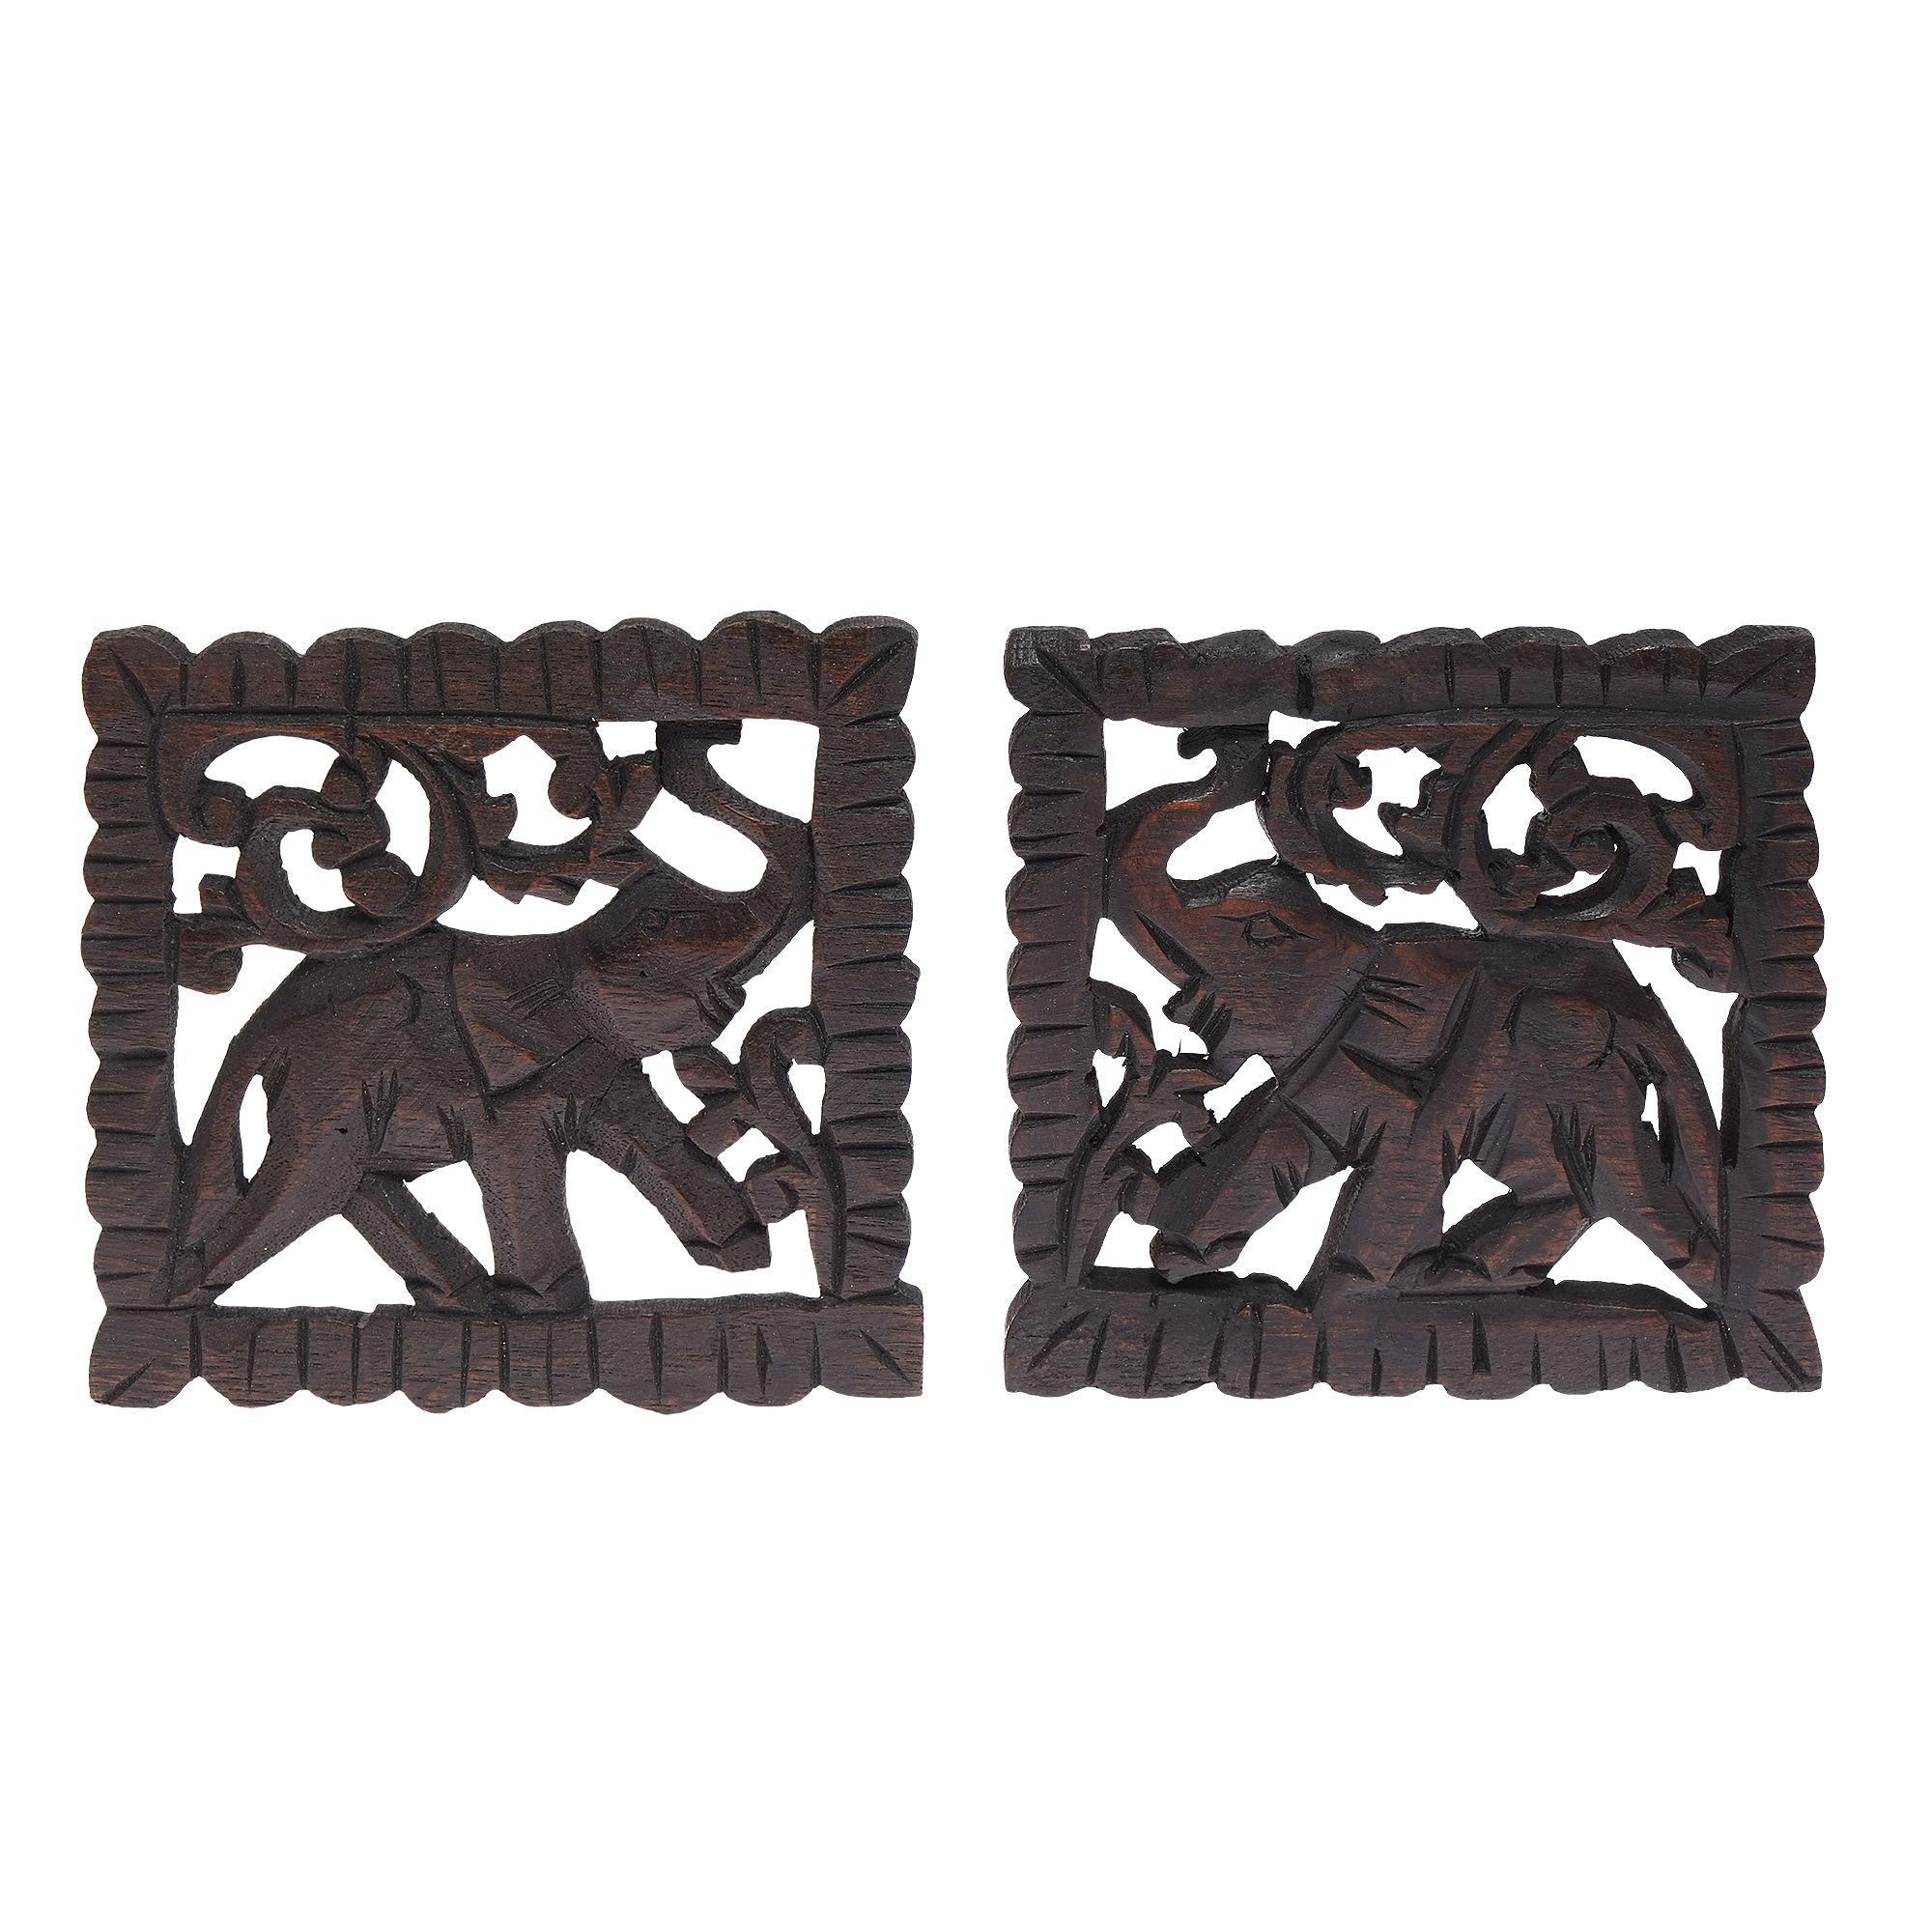 Aeravida elephant pair handmade teak wood relief panel wall art